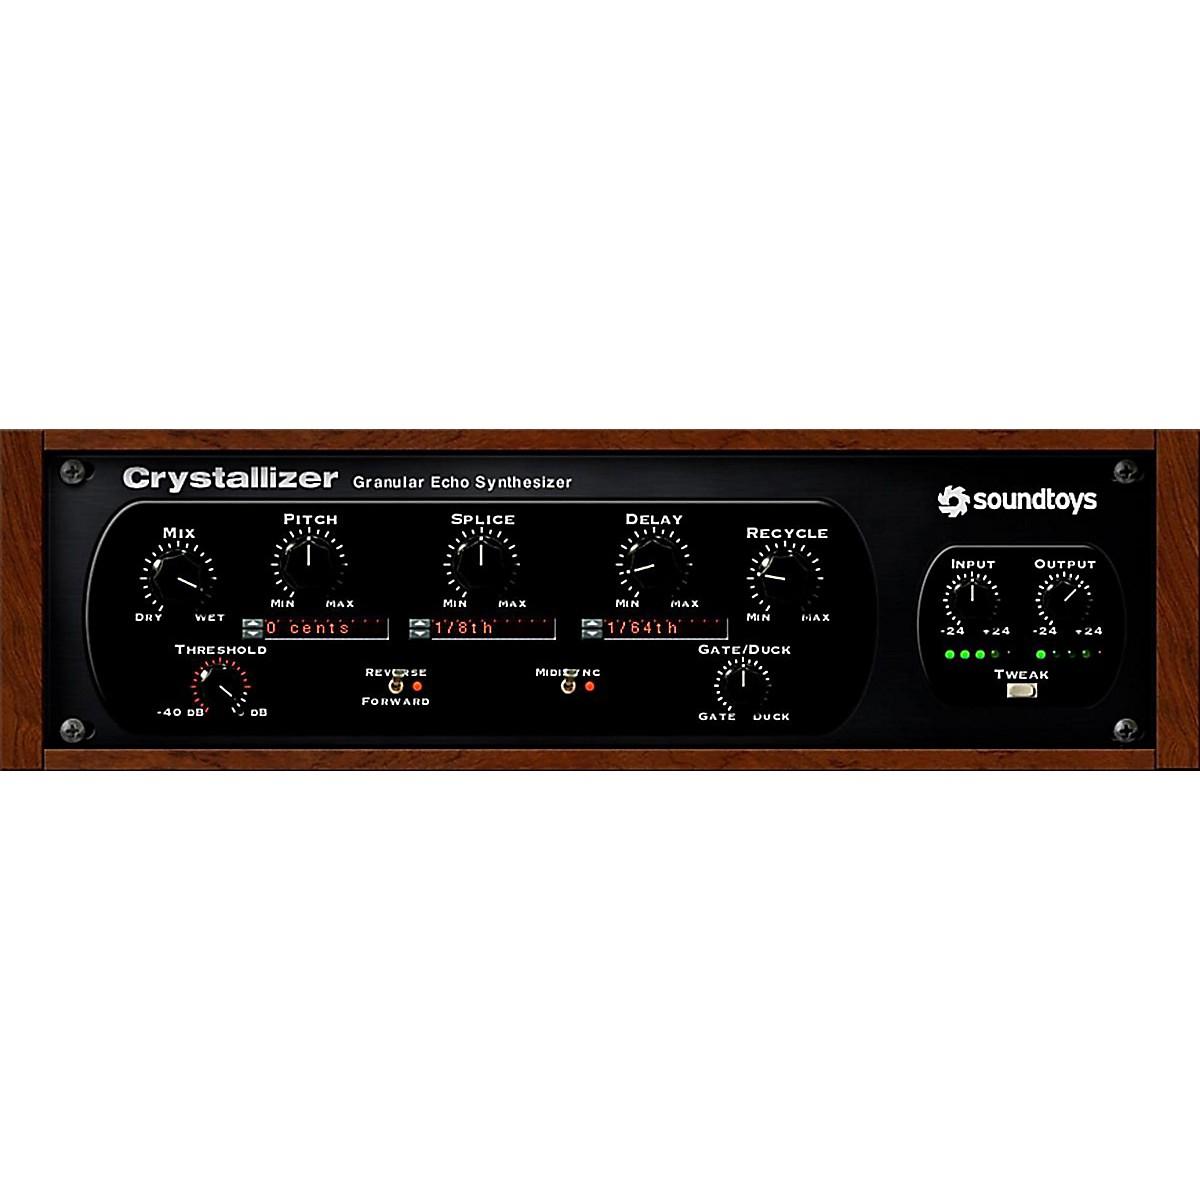 Soundtoys Crystallizer 5 Software Download